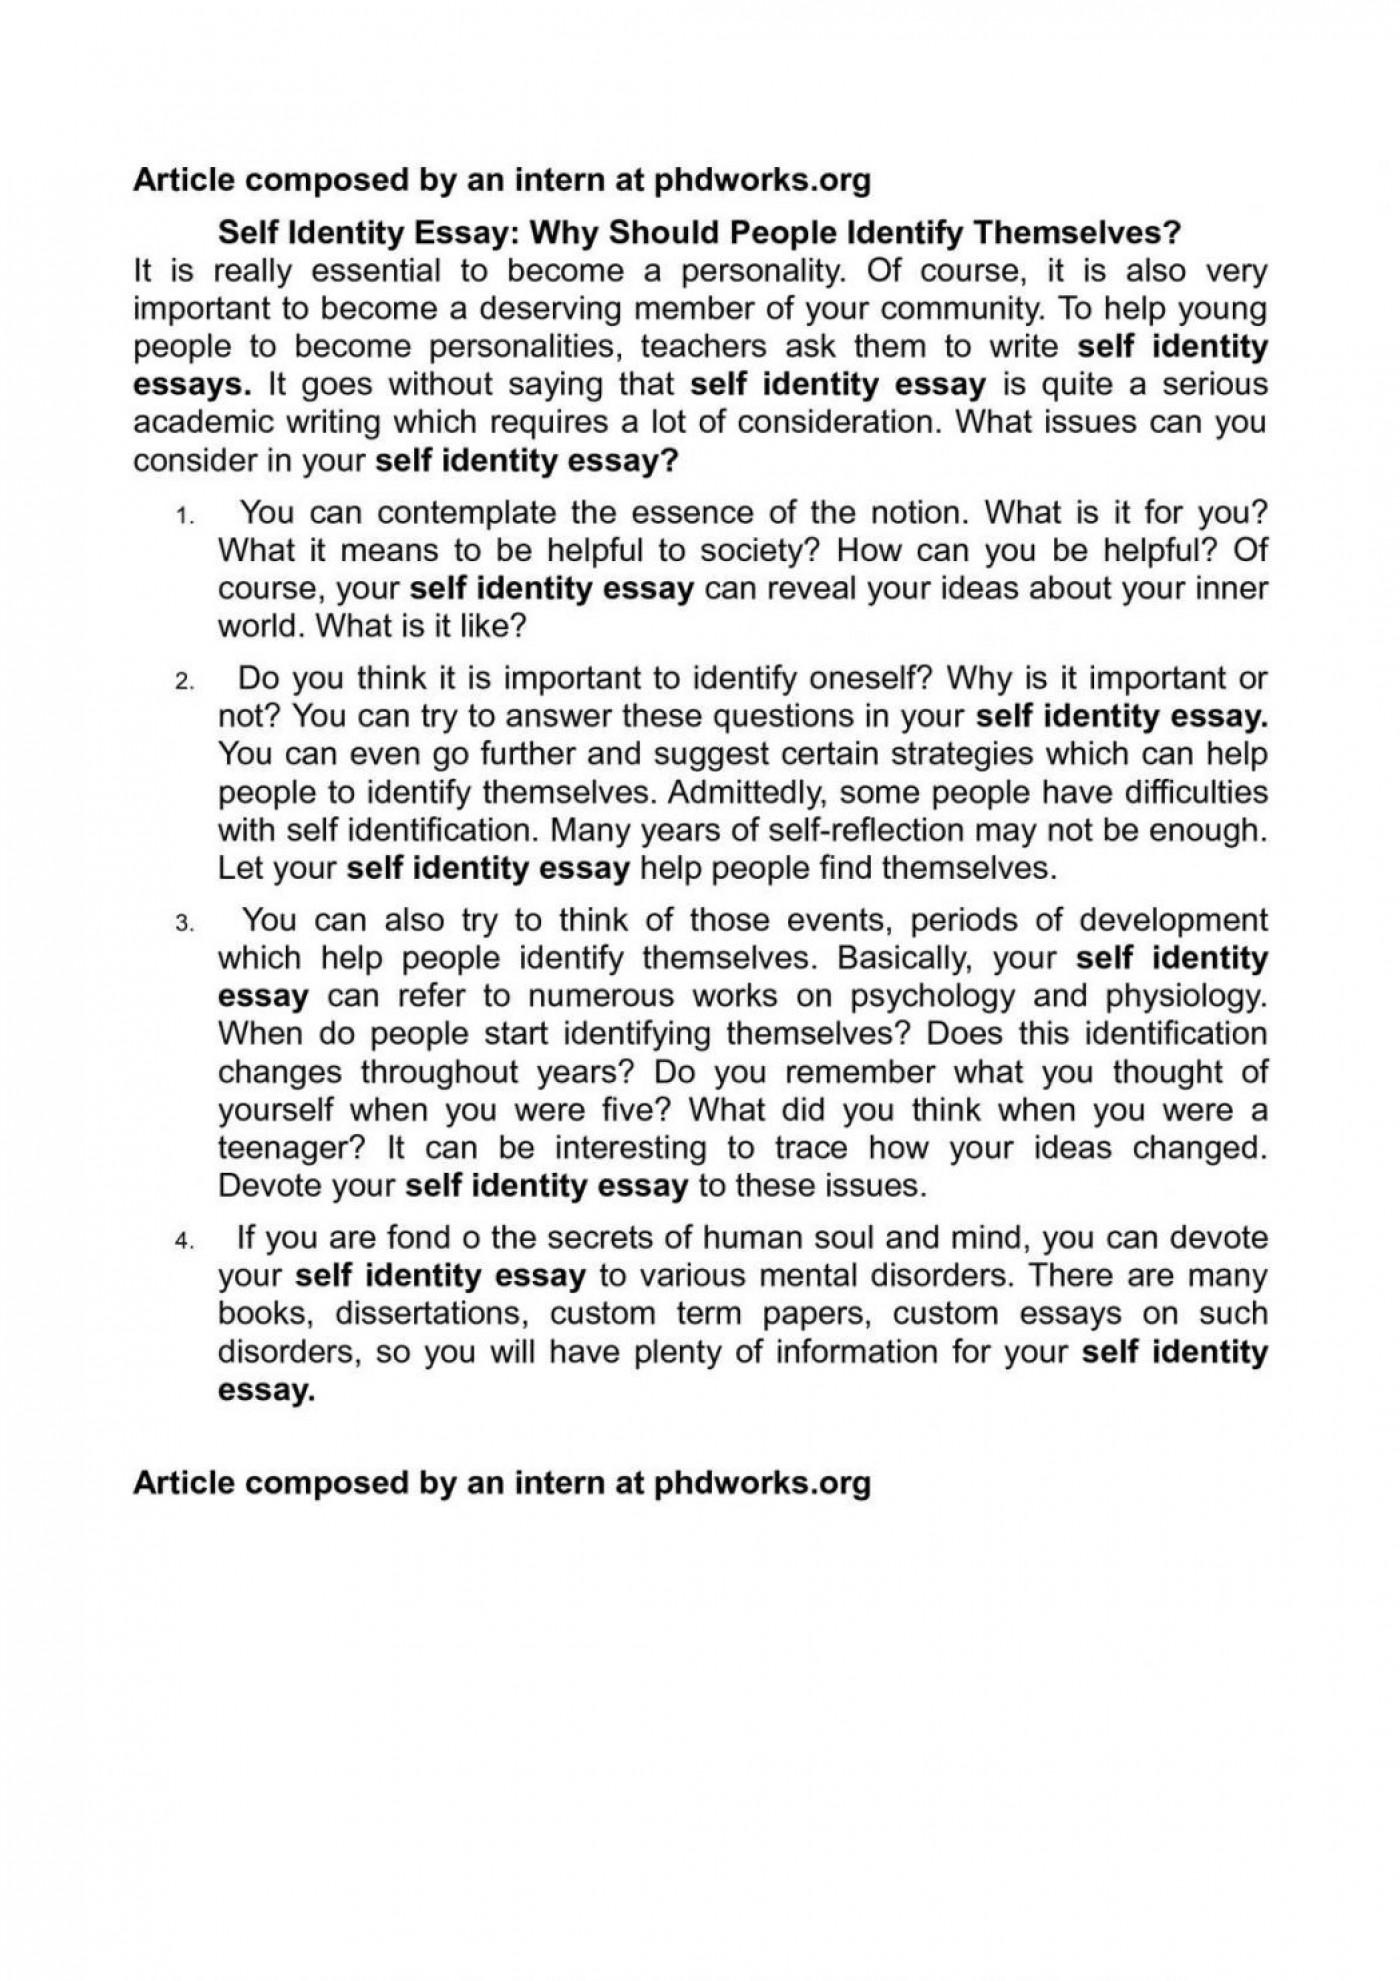 007 Essay Example Self Esteem Identity Examples Gilgamesh Essays On Heroes Examp Paper Low Wondrous Conclusion Wikipedia 1400